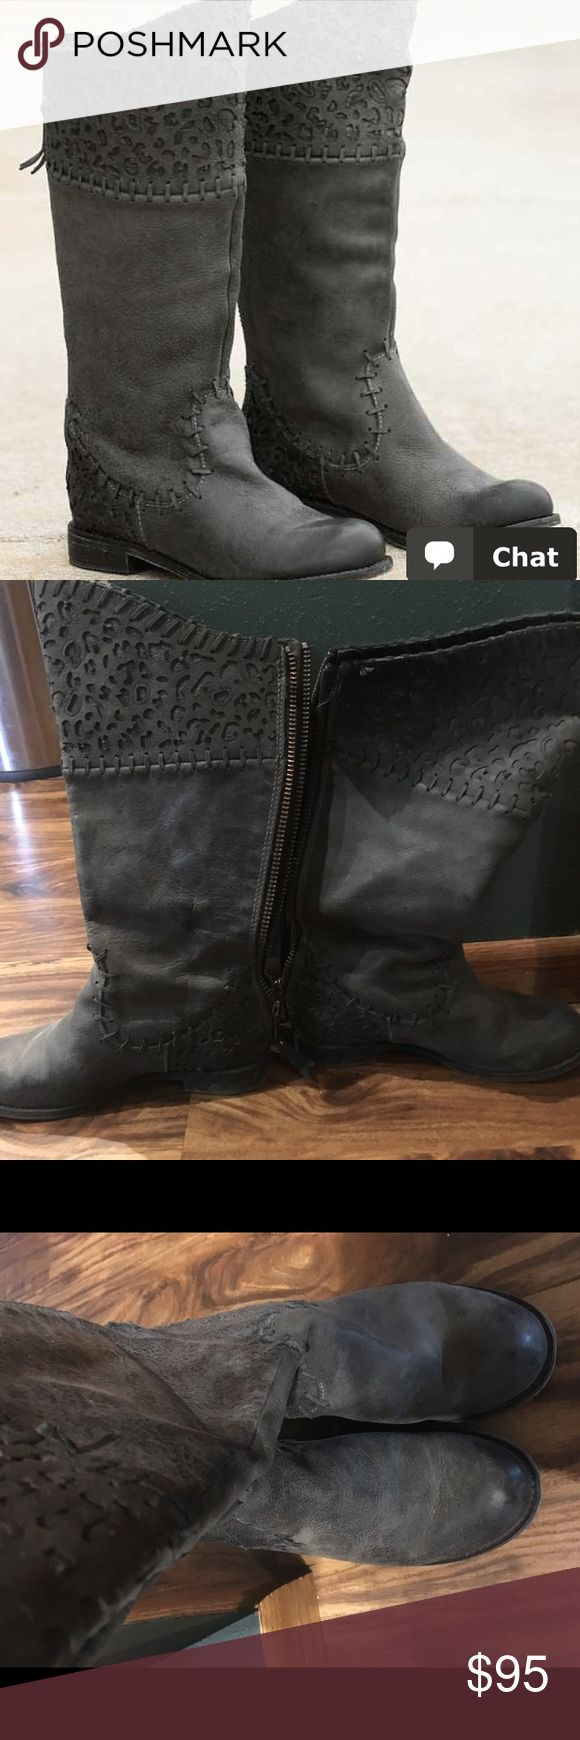 Selling this Grey corral boots on Poshmark! My username is: heatstomberg. #shopmycloset #poshmark #fashion #shopping #style #forsale #corral #Shoes